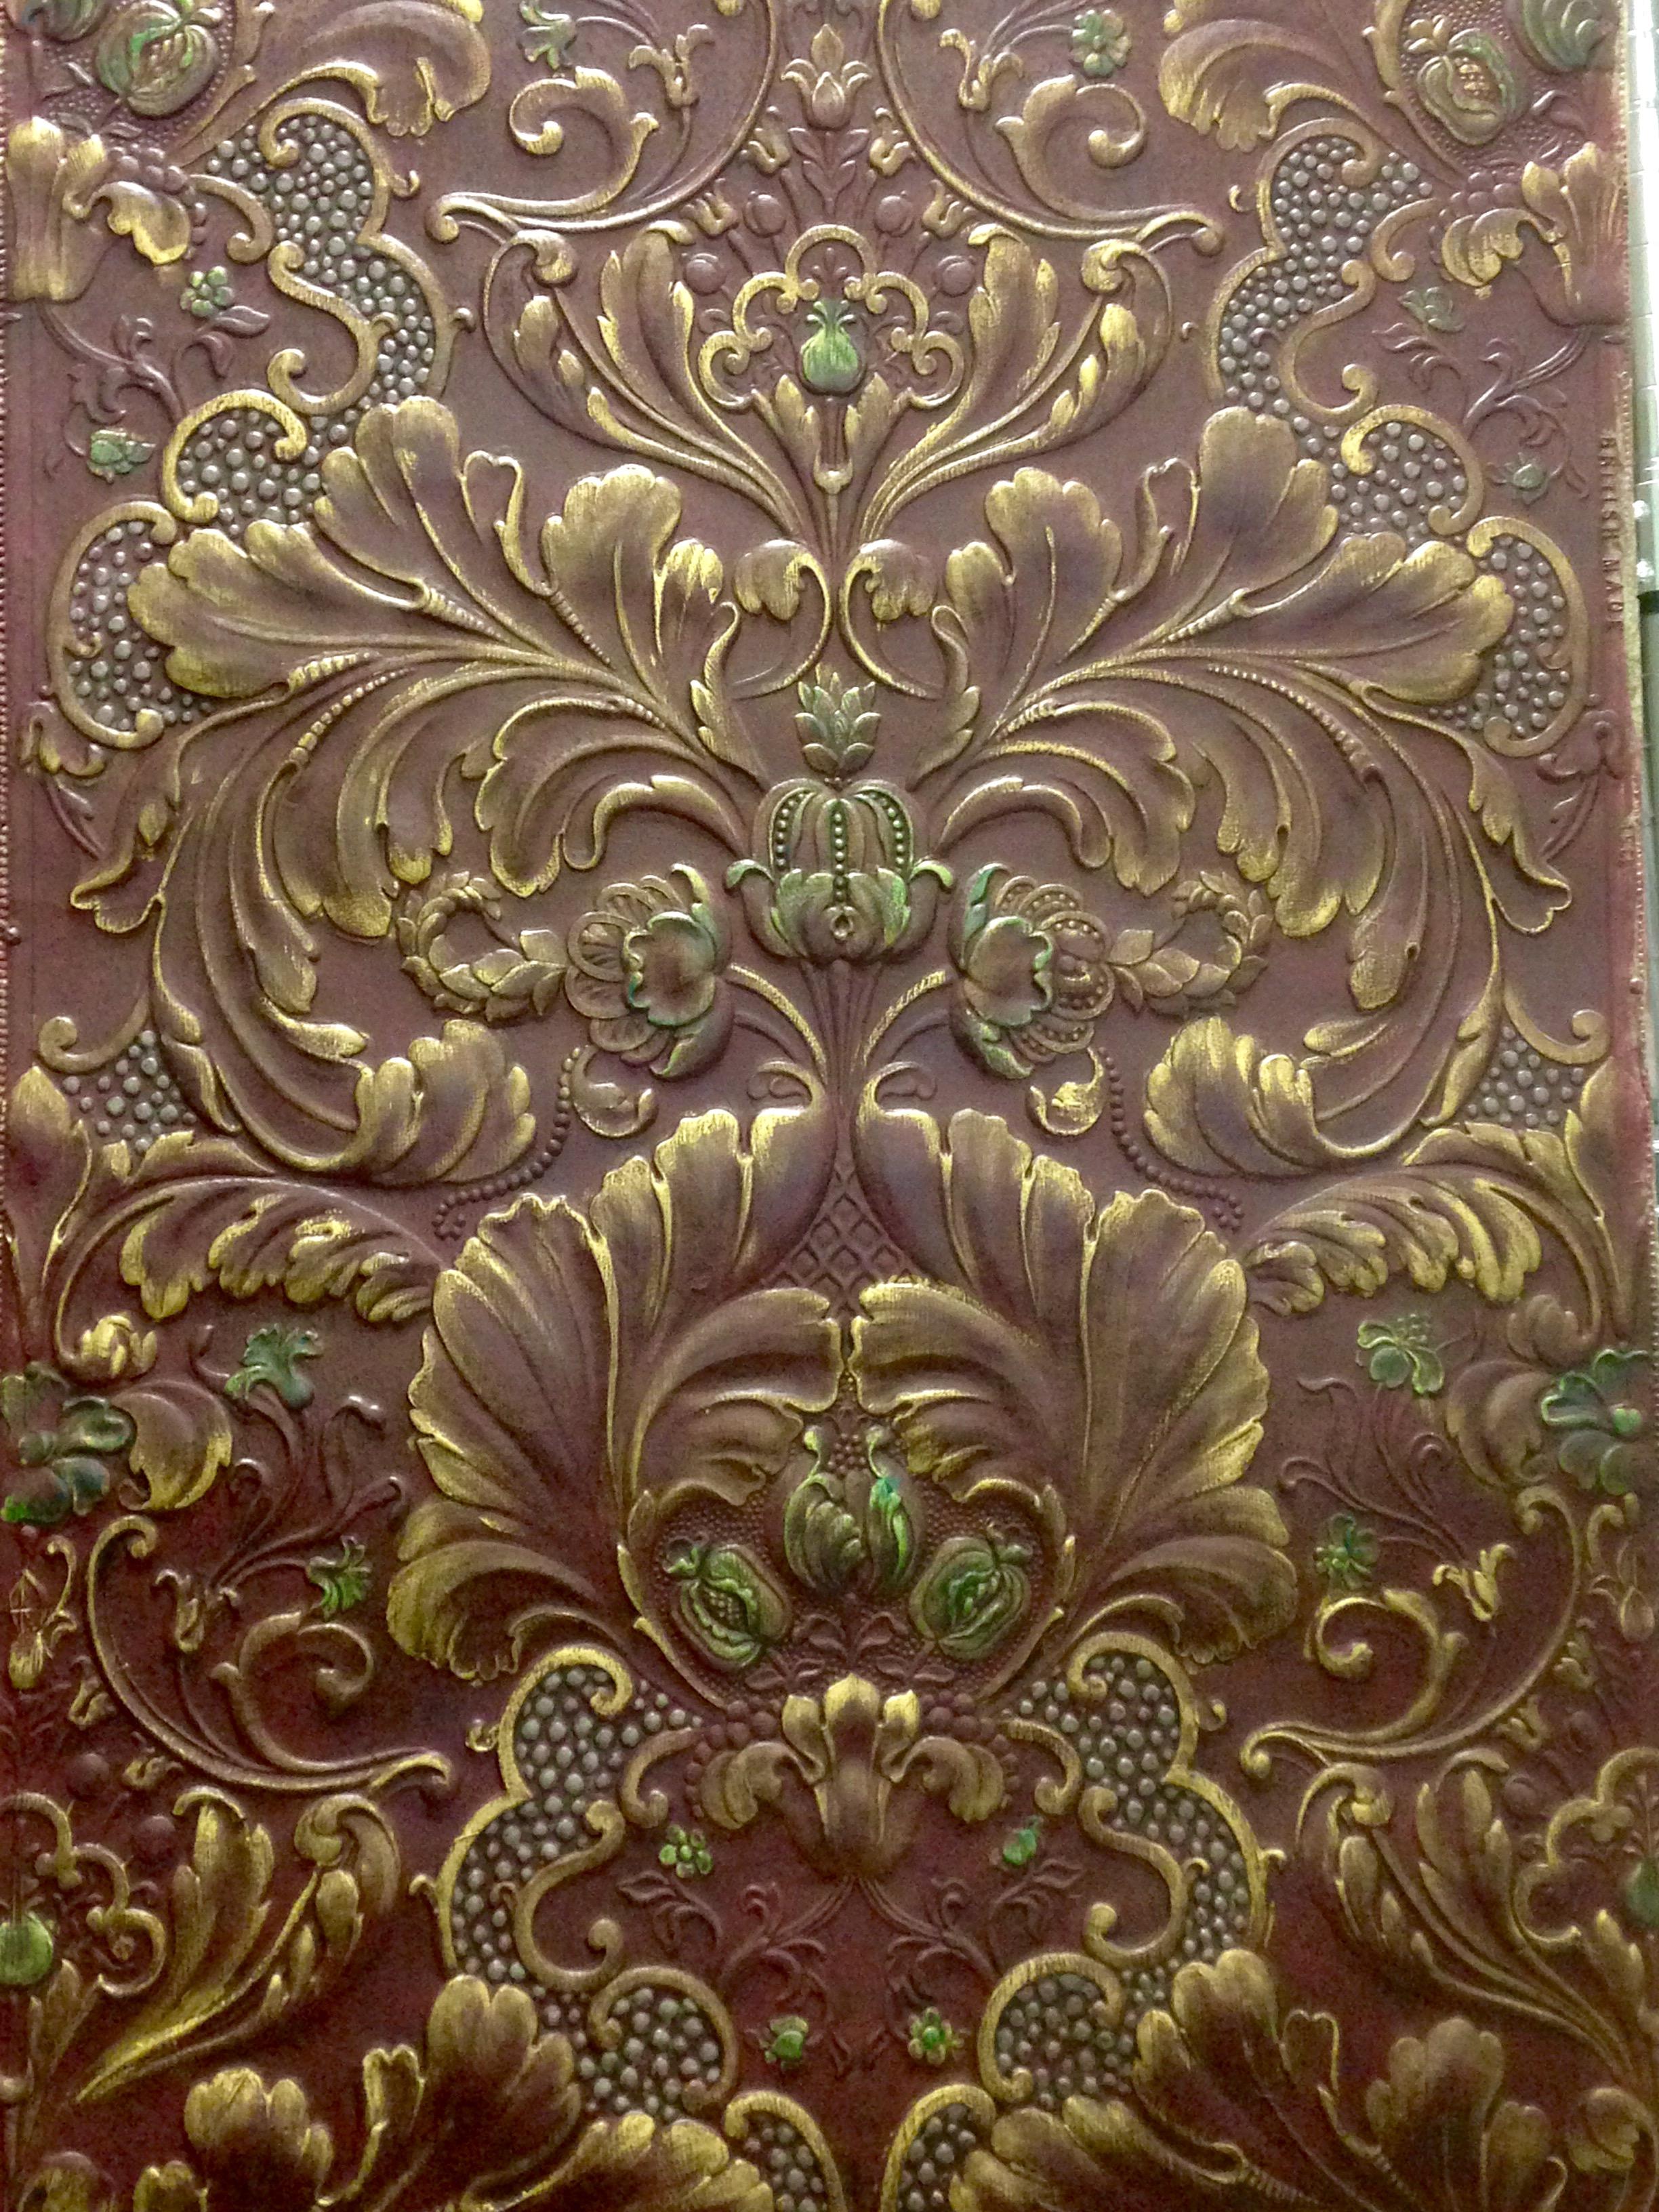 Artworks Adventures of a decorative painter 2448x3264